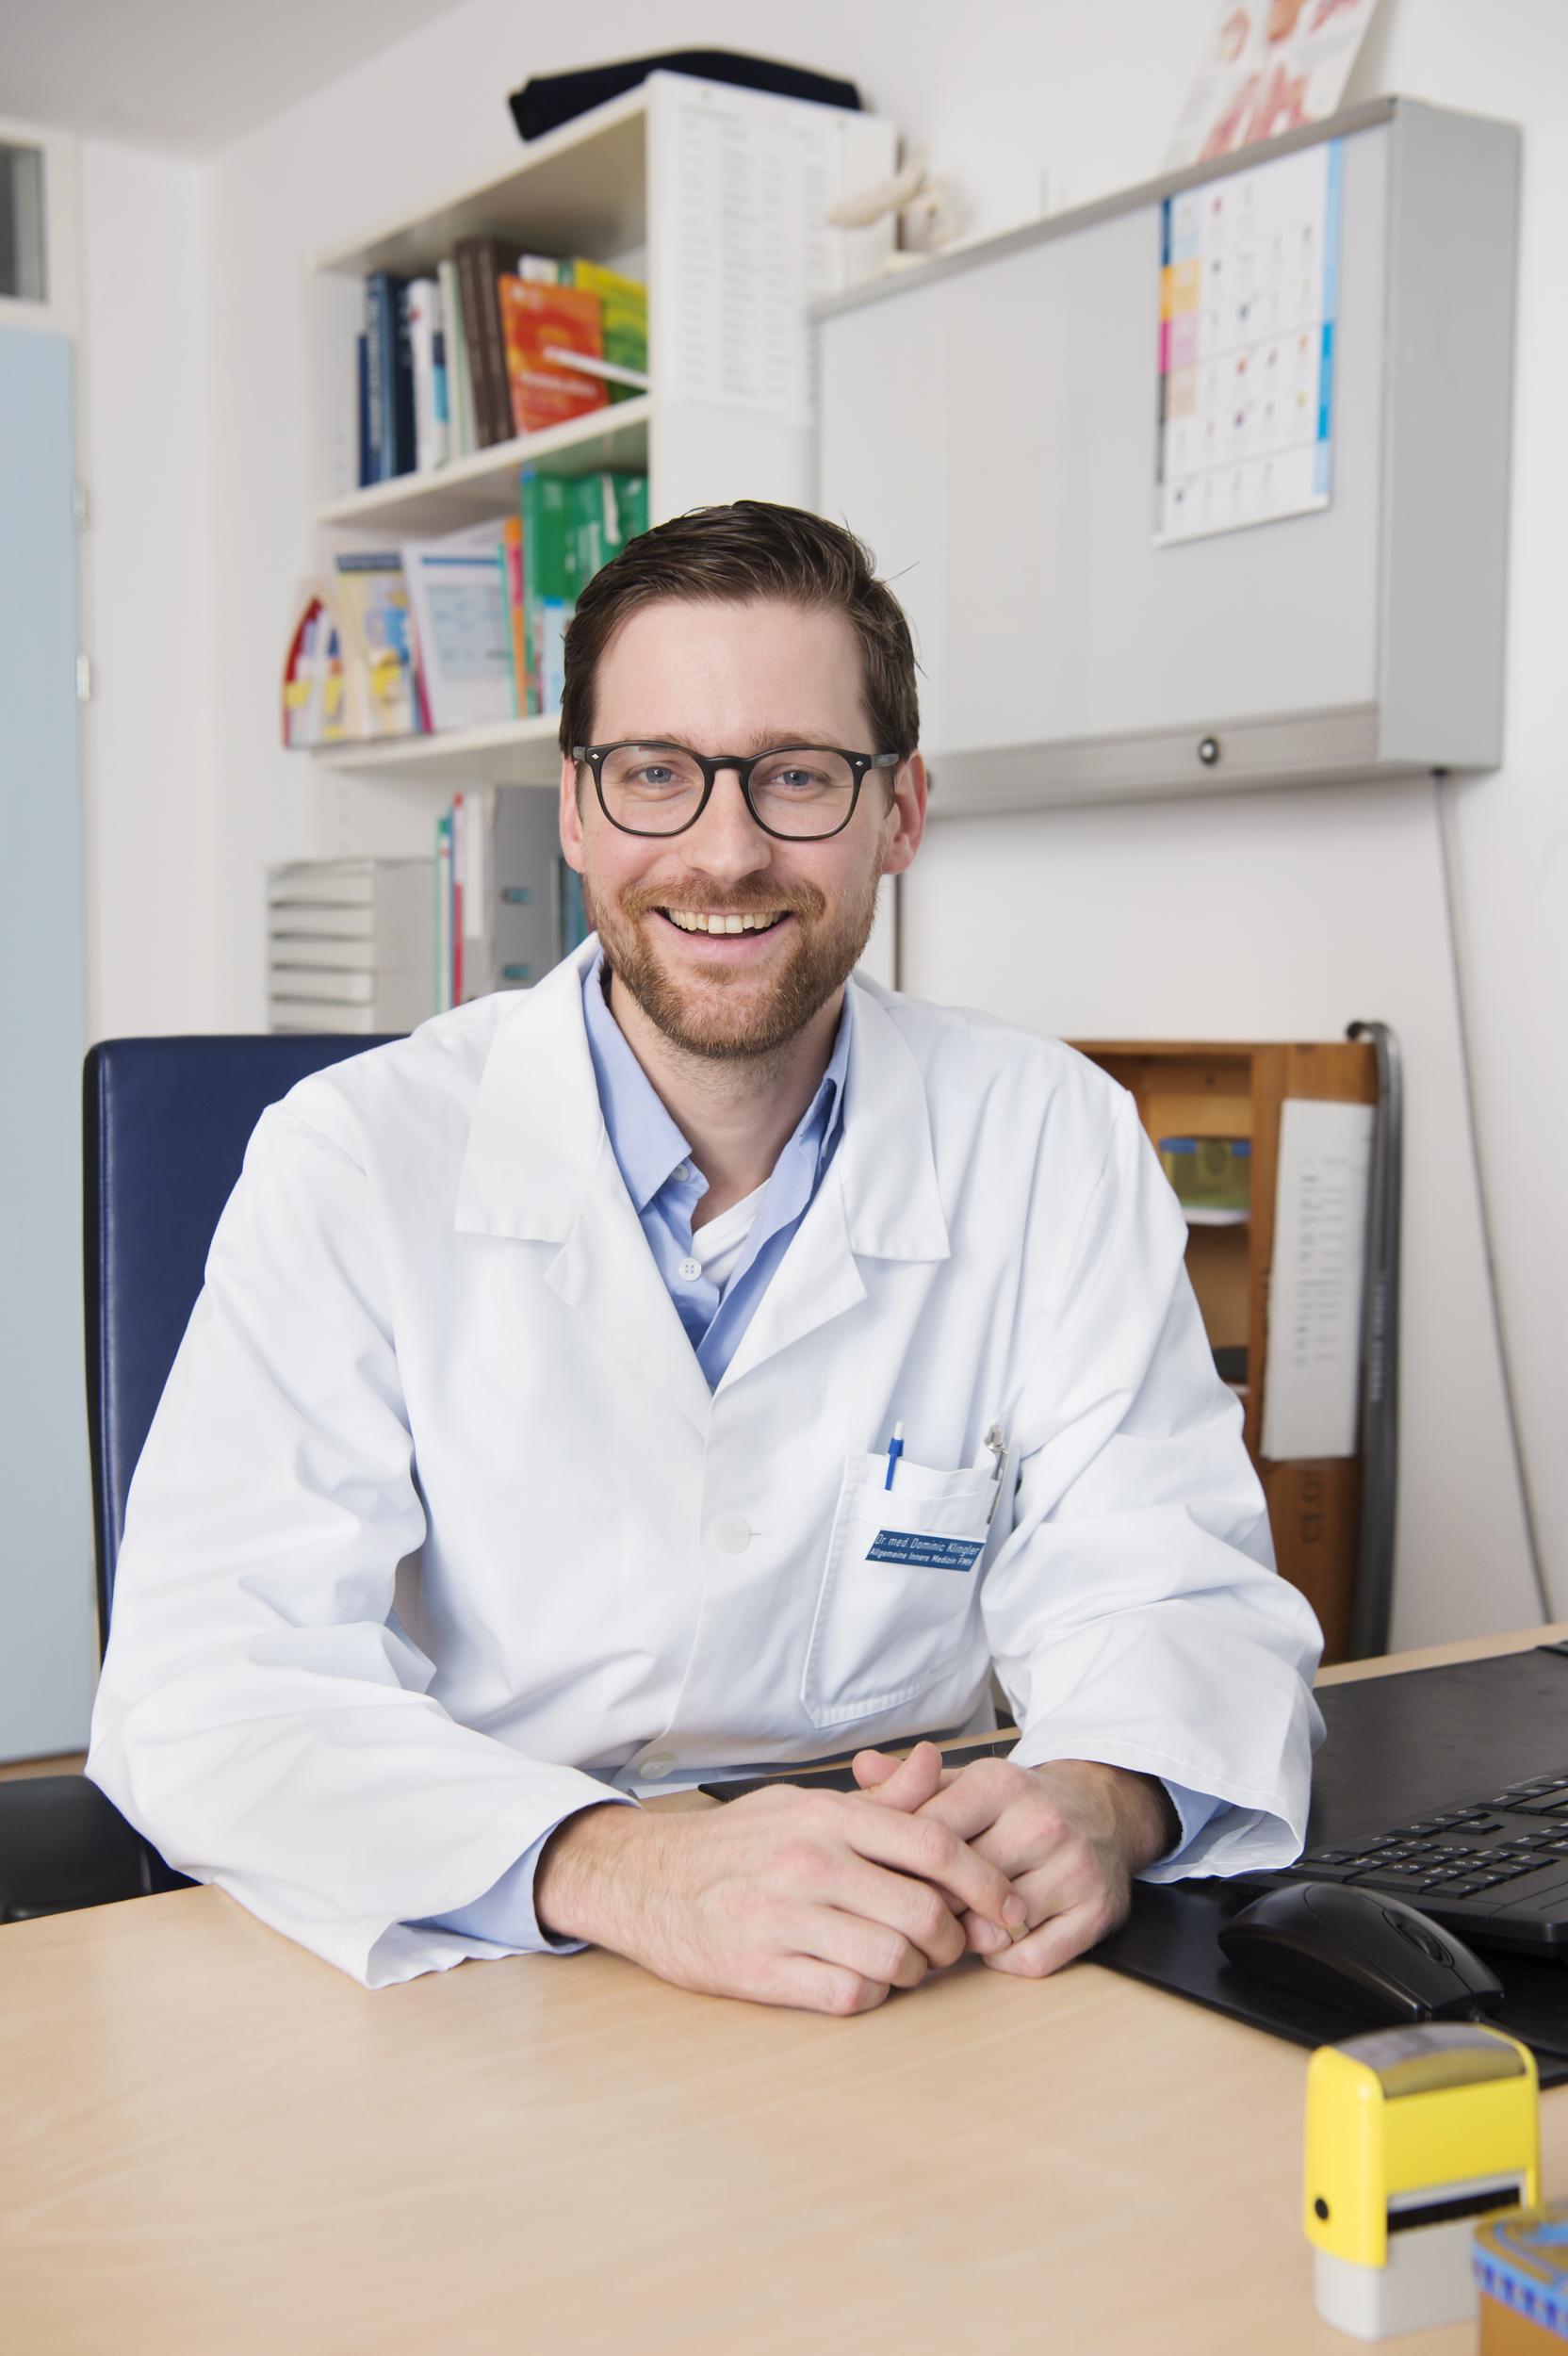 Dr. Dominic Klingler